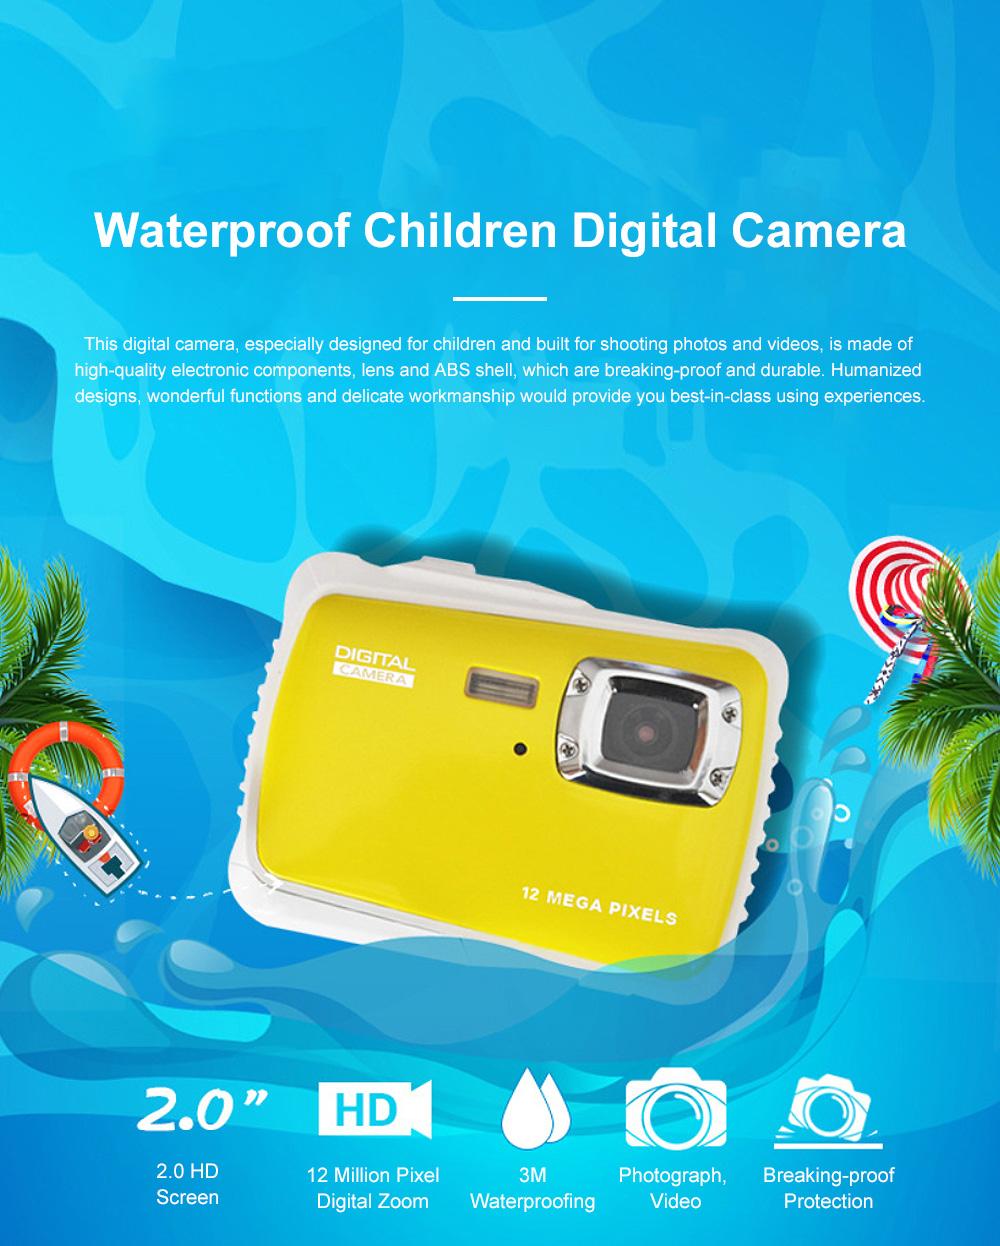 Cute Portable HD Waterproof Shock-proof 12 Million Pixels Zoom Digital Camera for Children 3M Waterproofing Cam 0